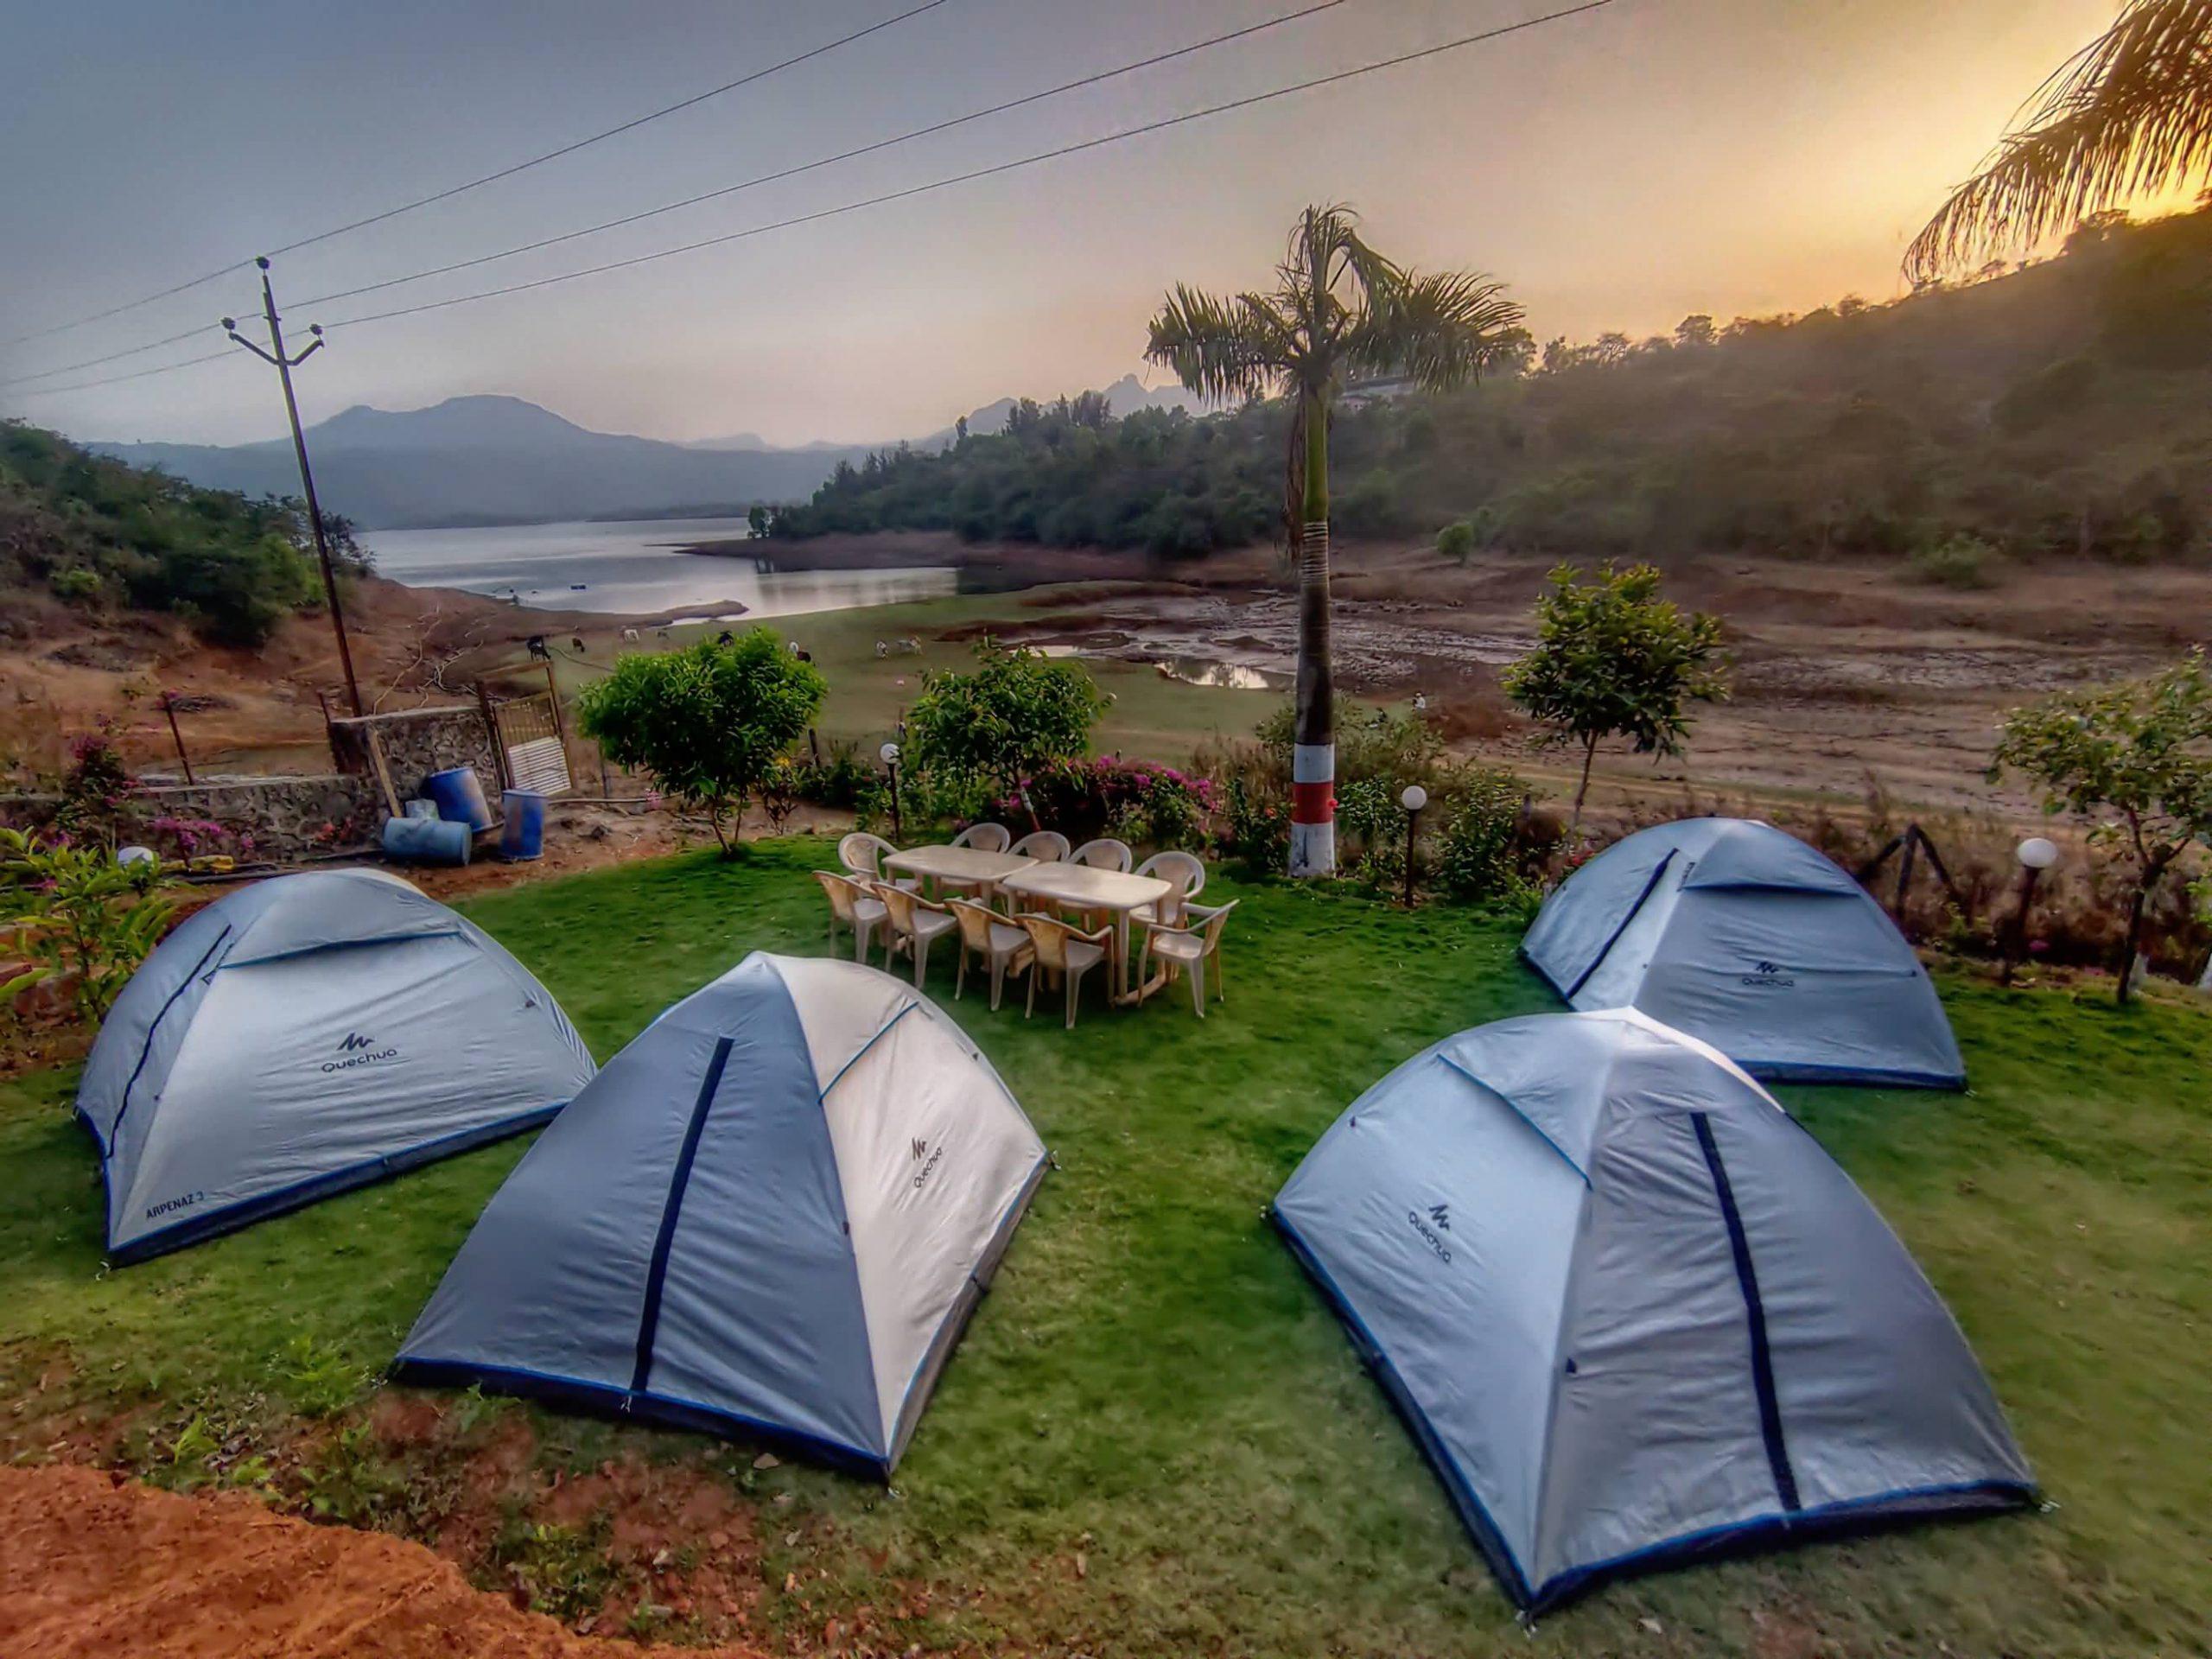 Tent Camping at HAVE Villas JMD Farm, Pawna Lake, Lonavala